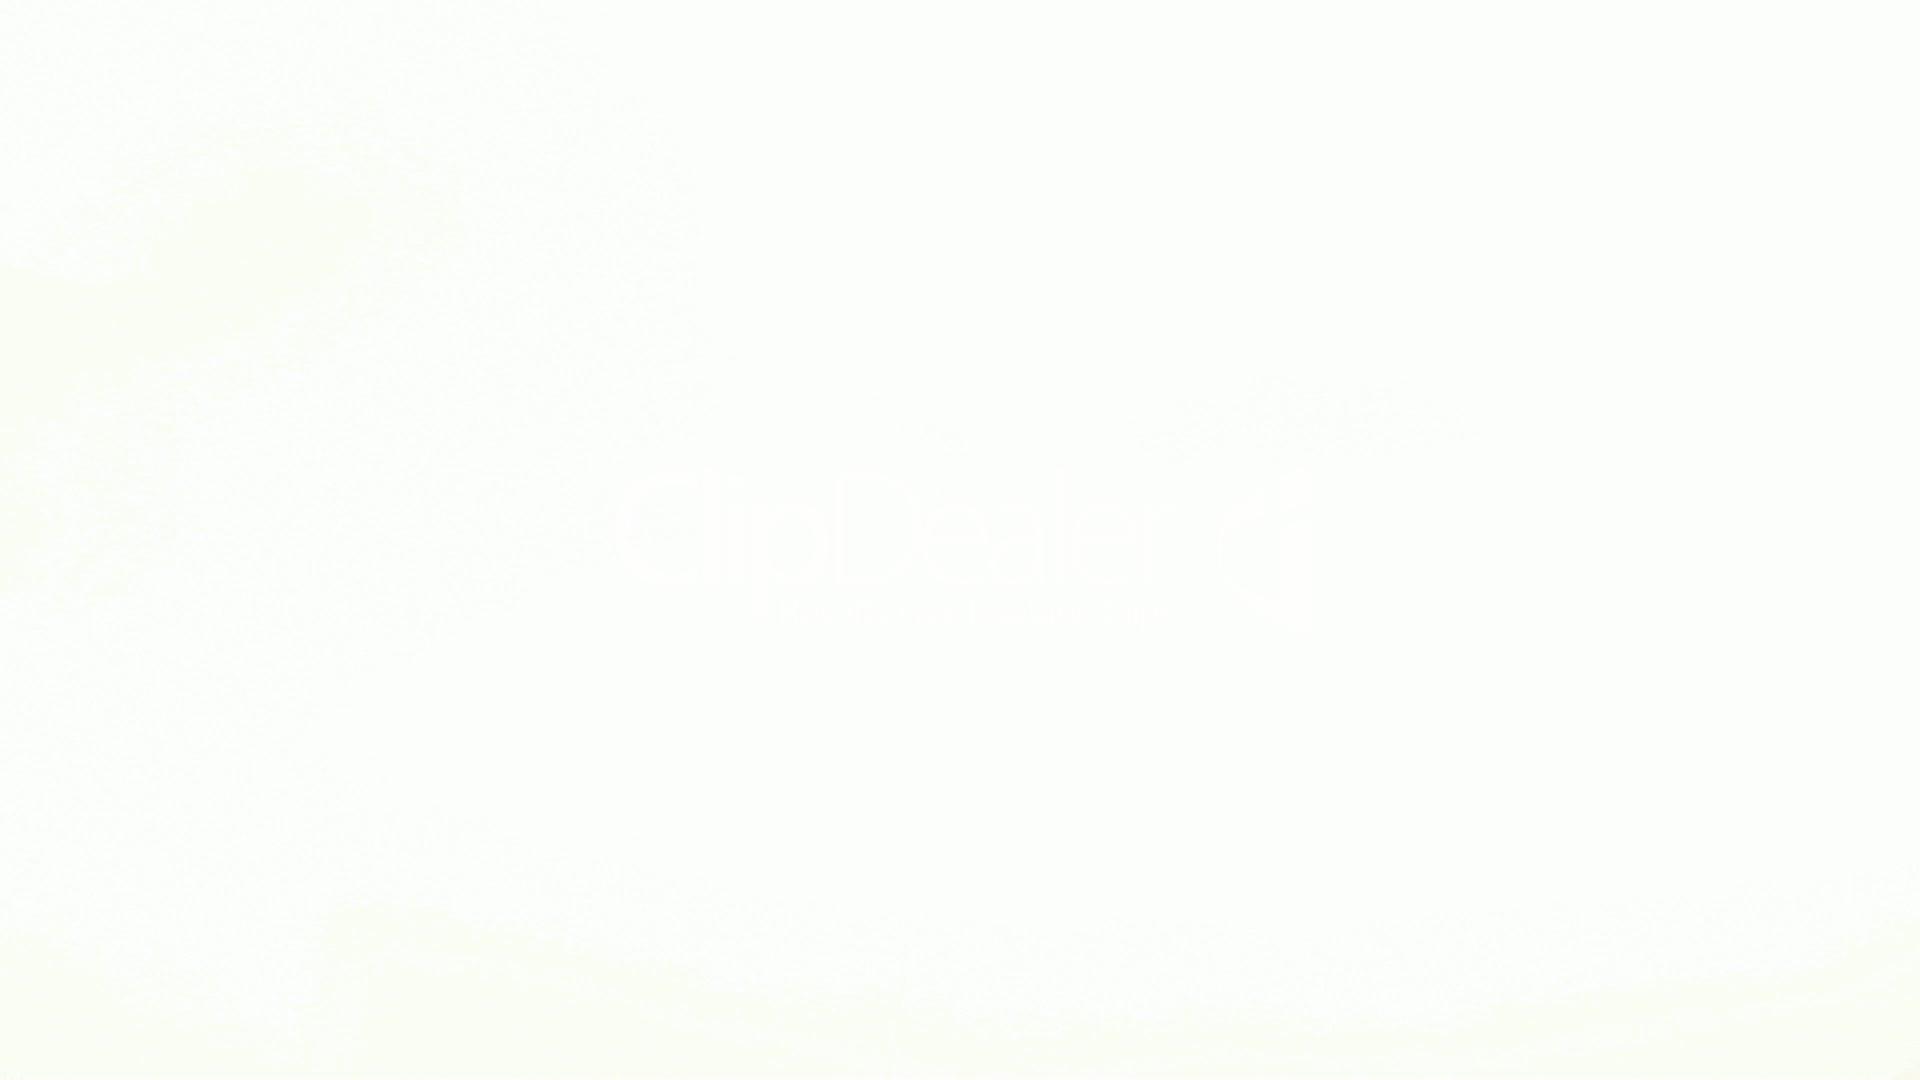 white-background-02